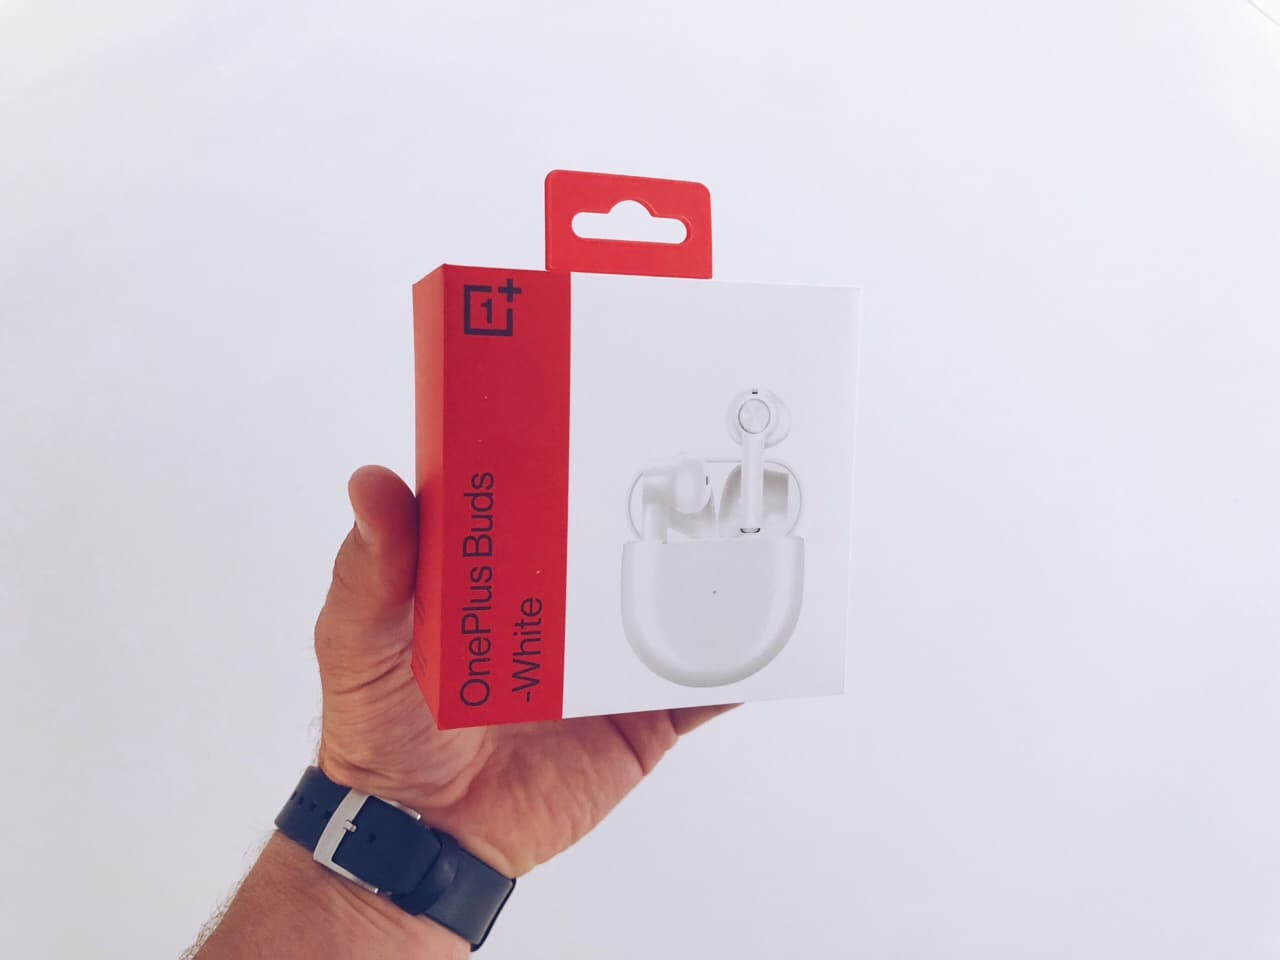 OnePlus Buds box